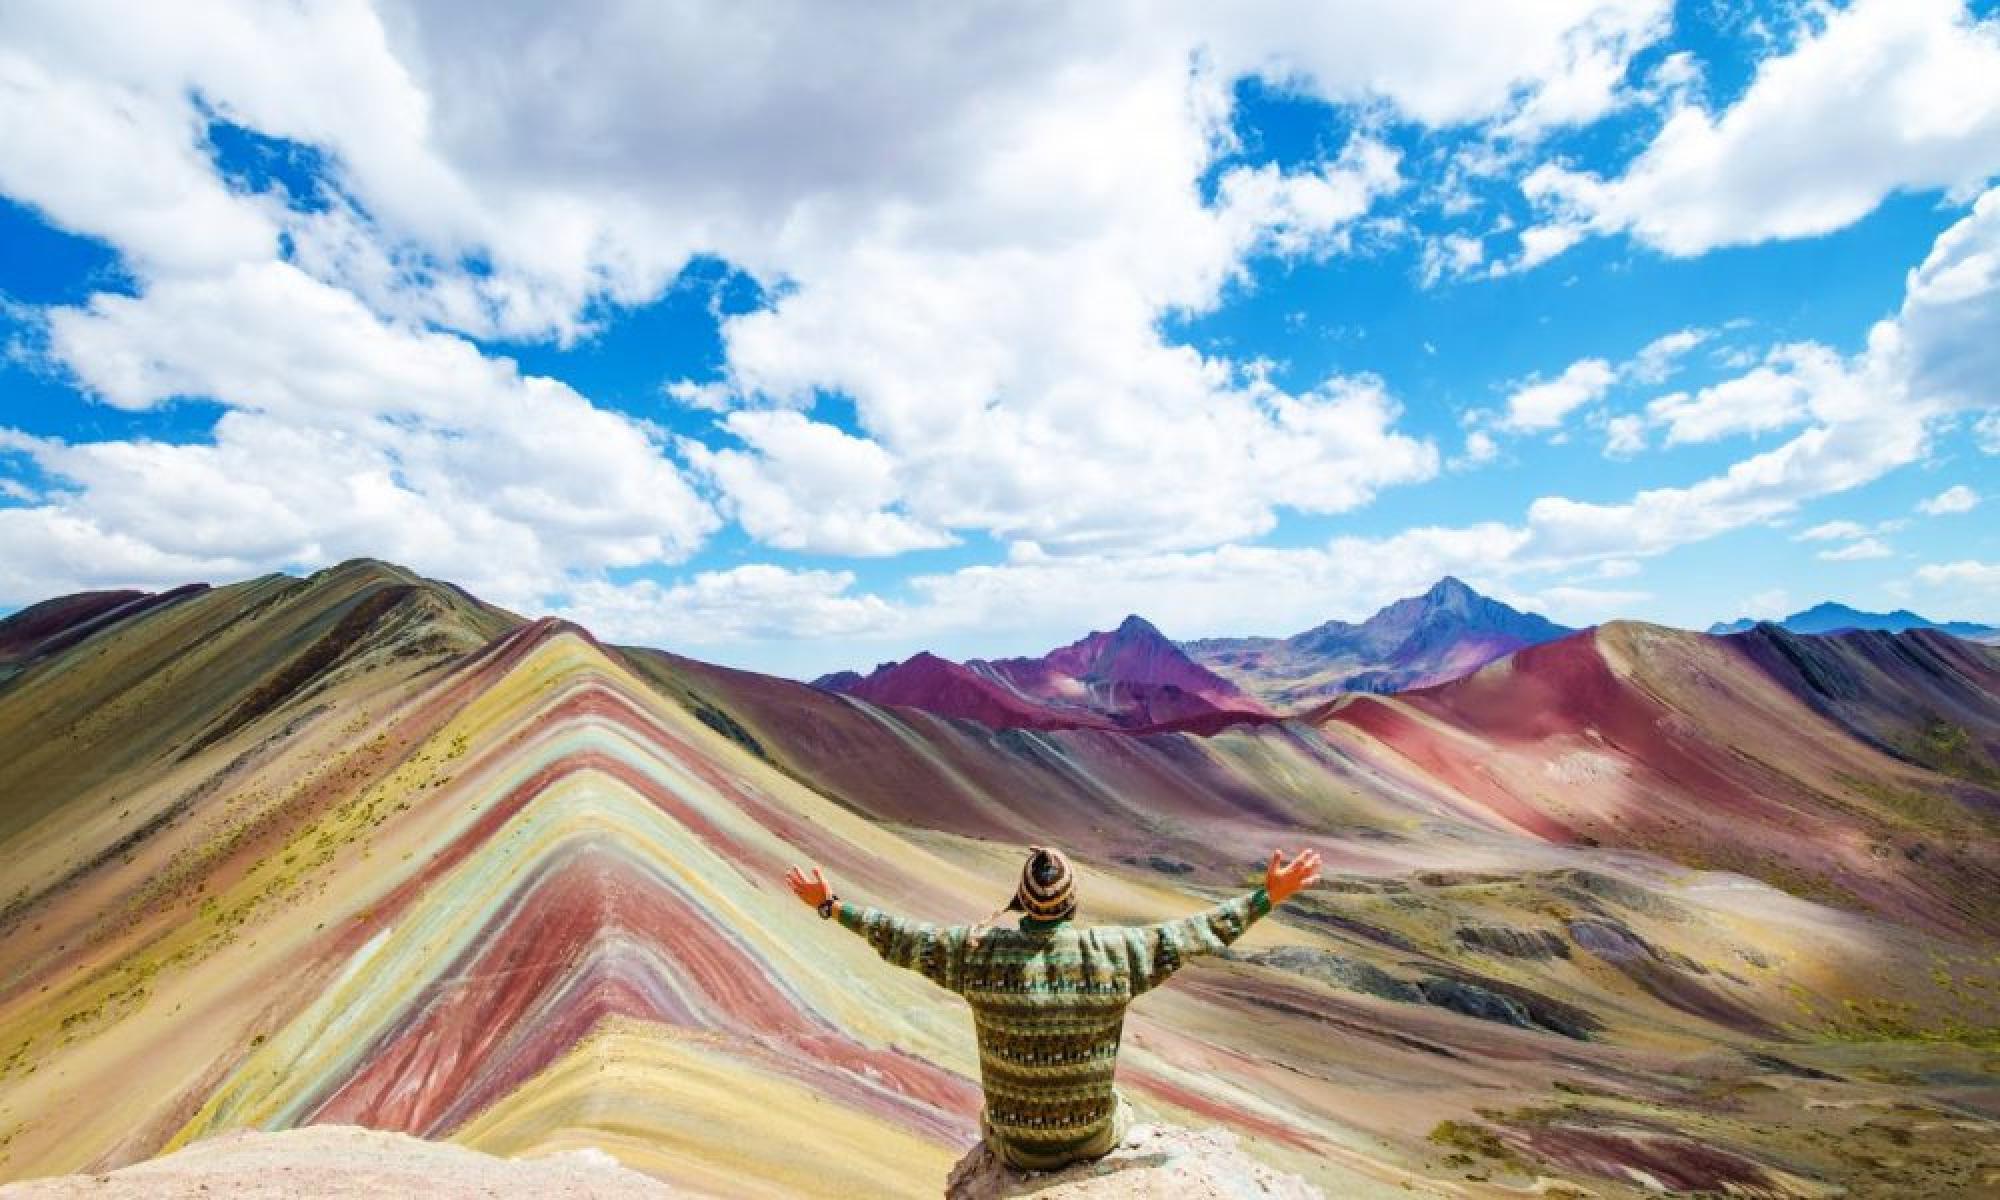 Vinicunca Rainbow Mountain Full-Day Tour